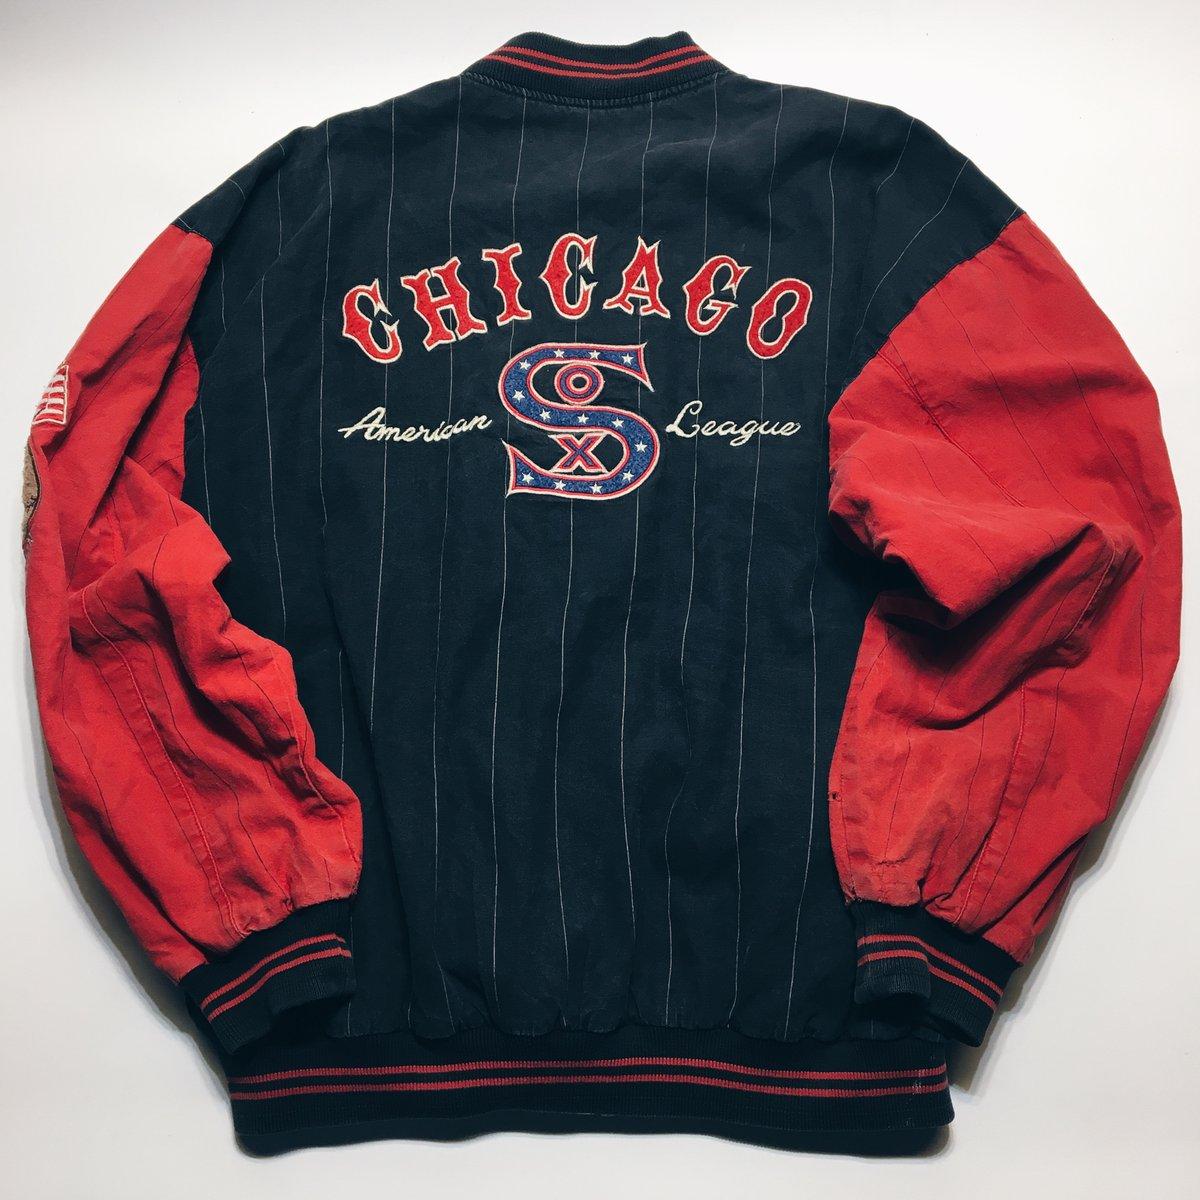 Image of Original 1991 Mirage Sports Chicago Sox Jacket.